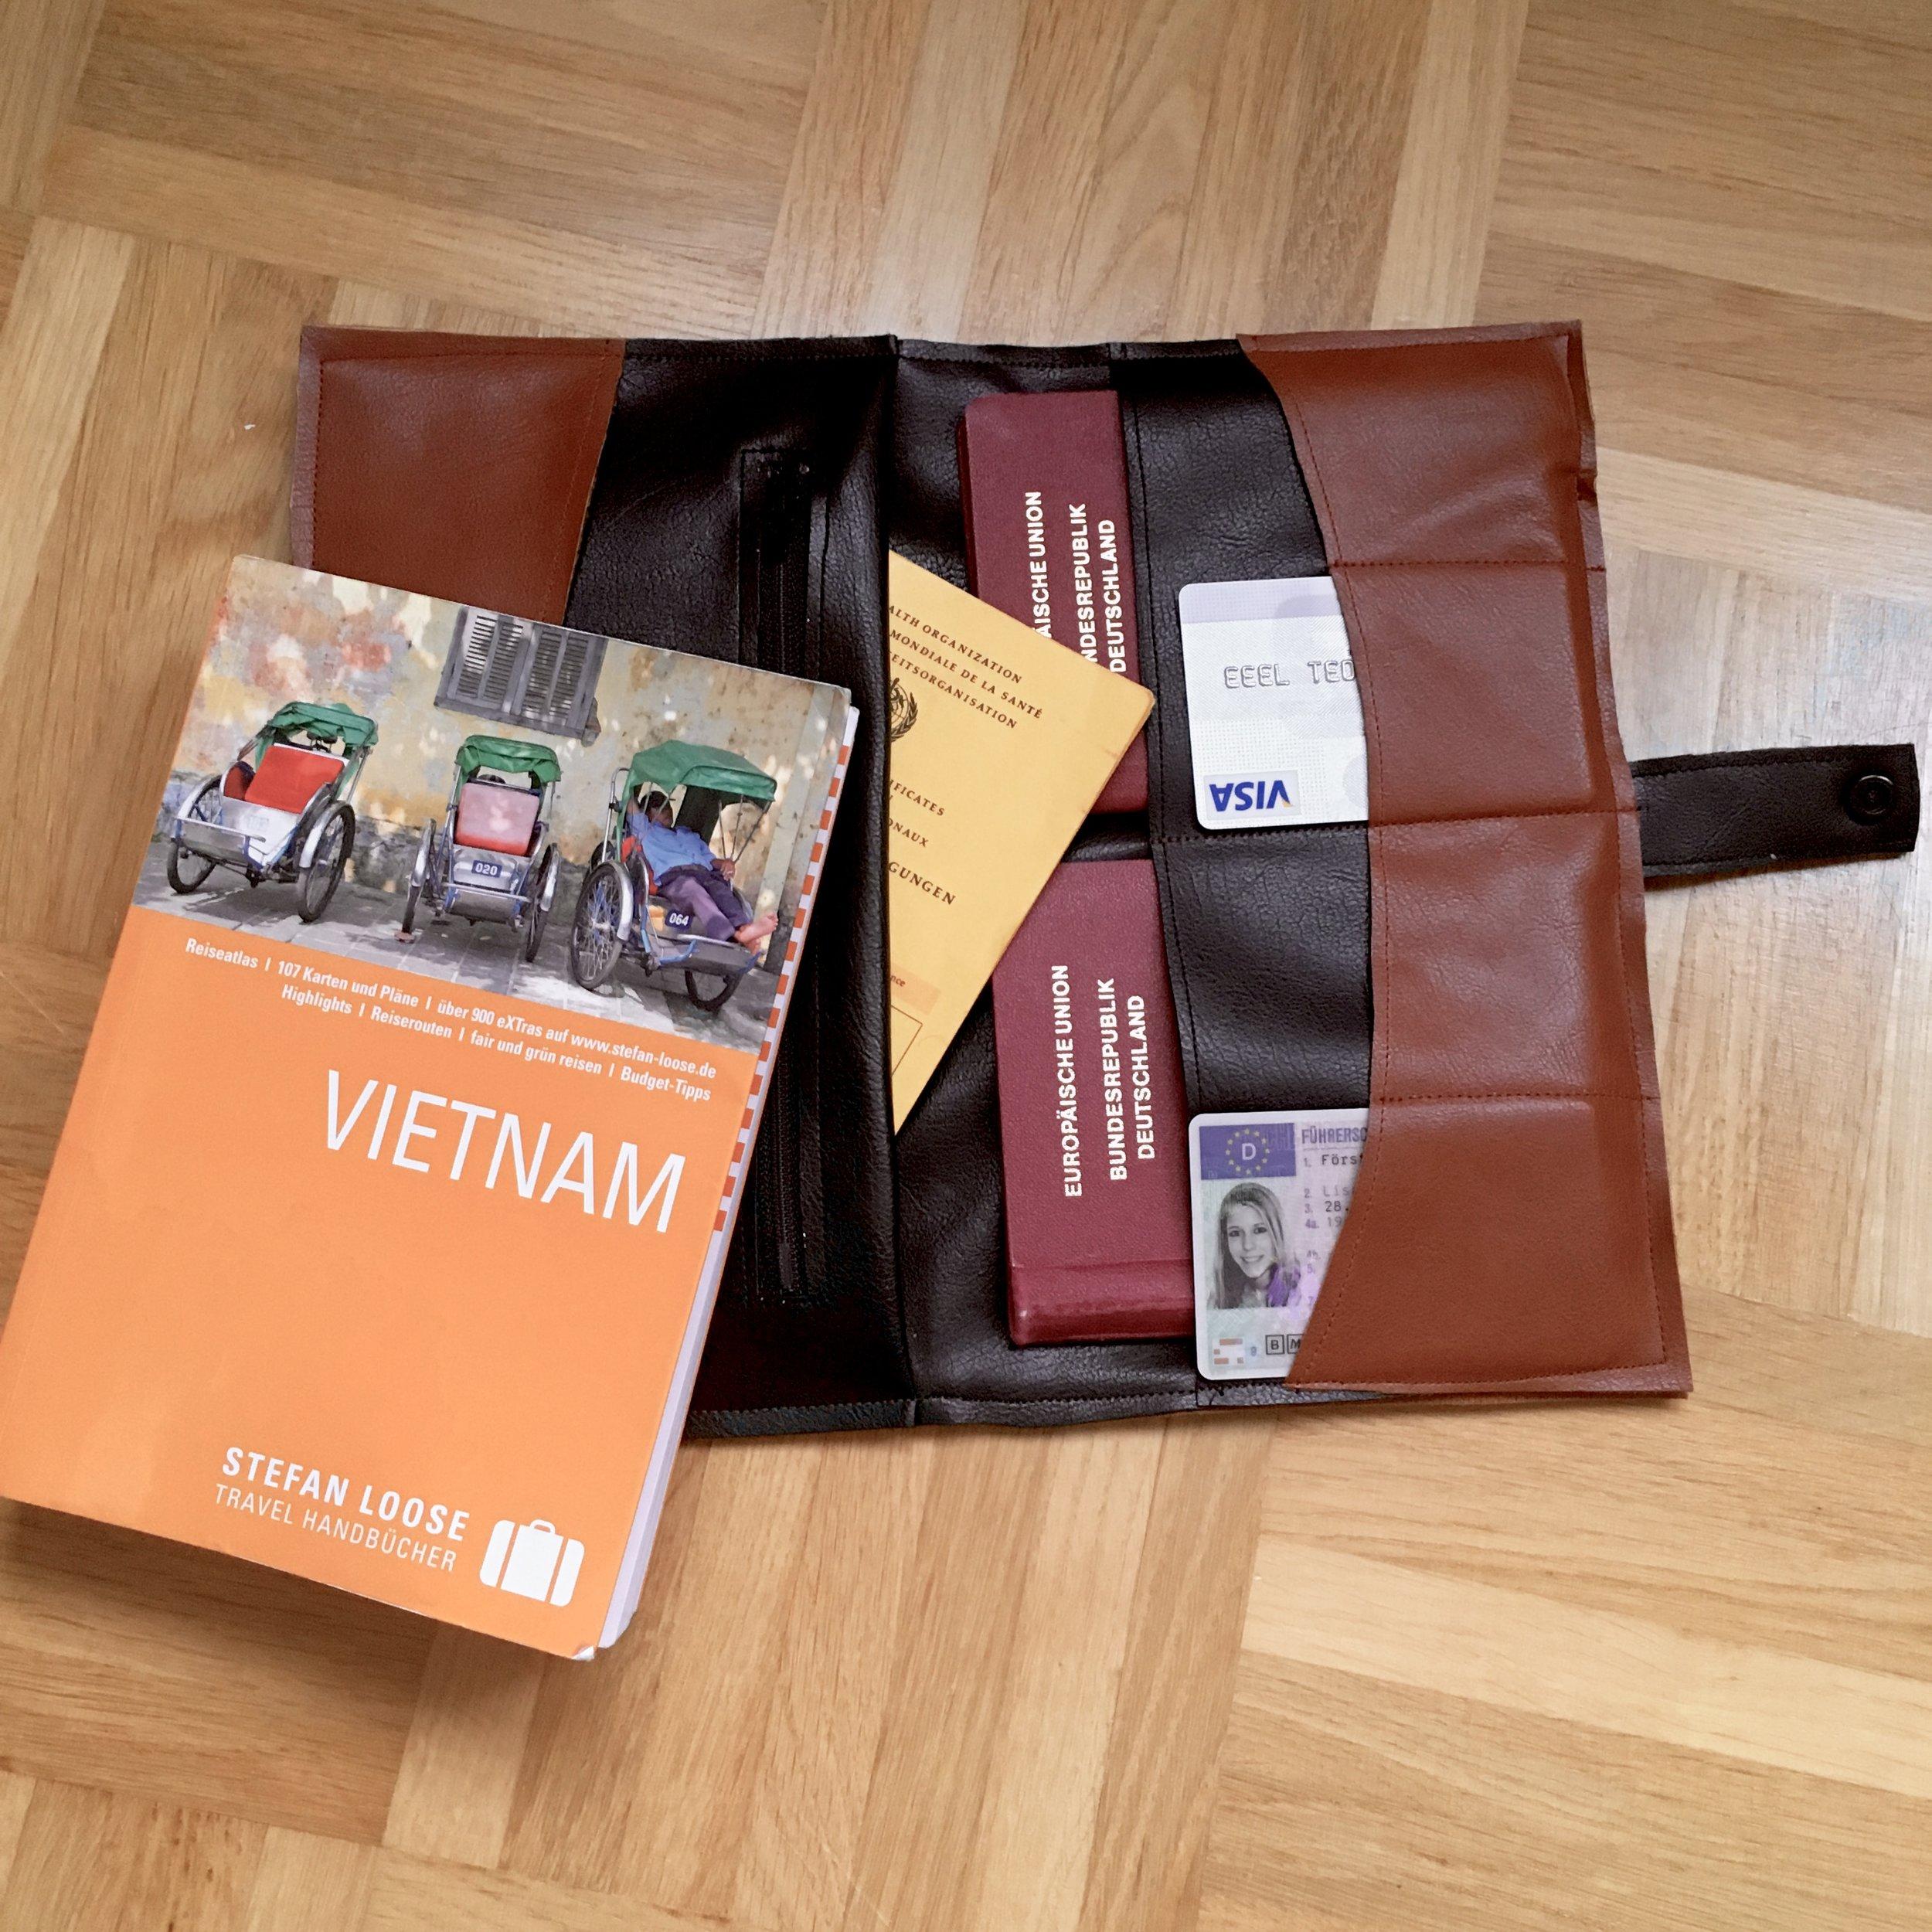 Vietnam kann kommen